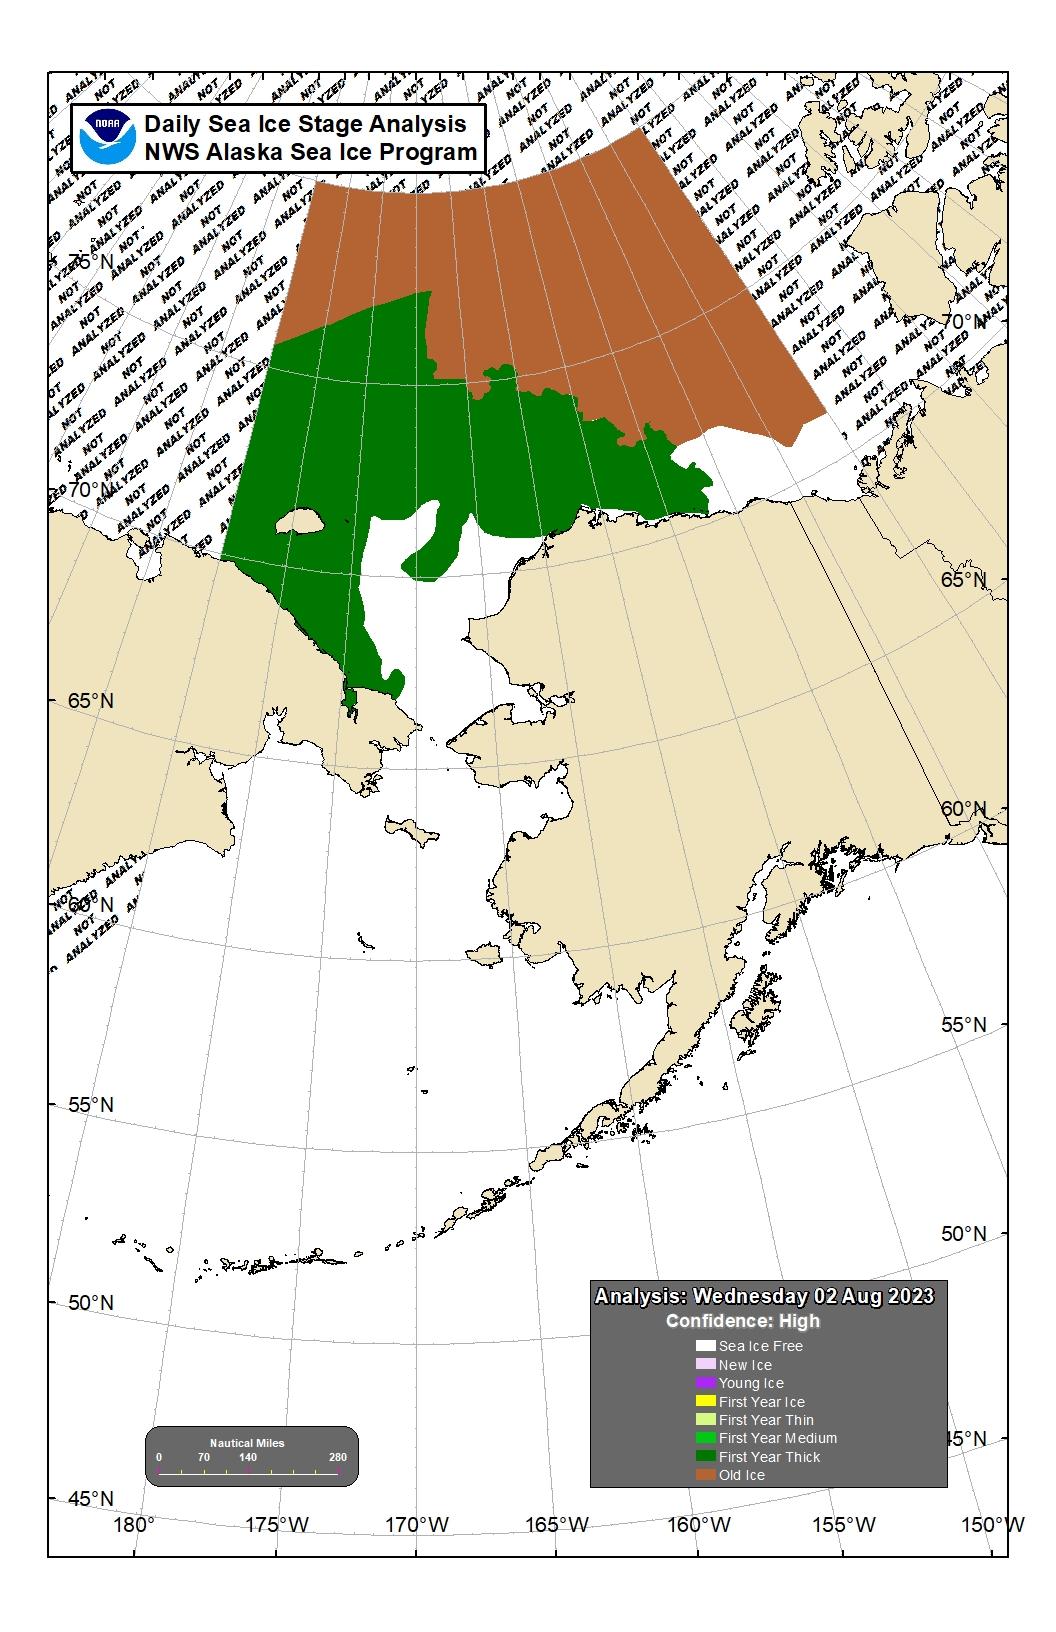 NWS Alaska Sea Ice Program (ASIP)